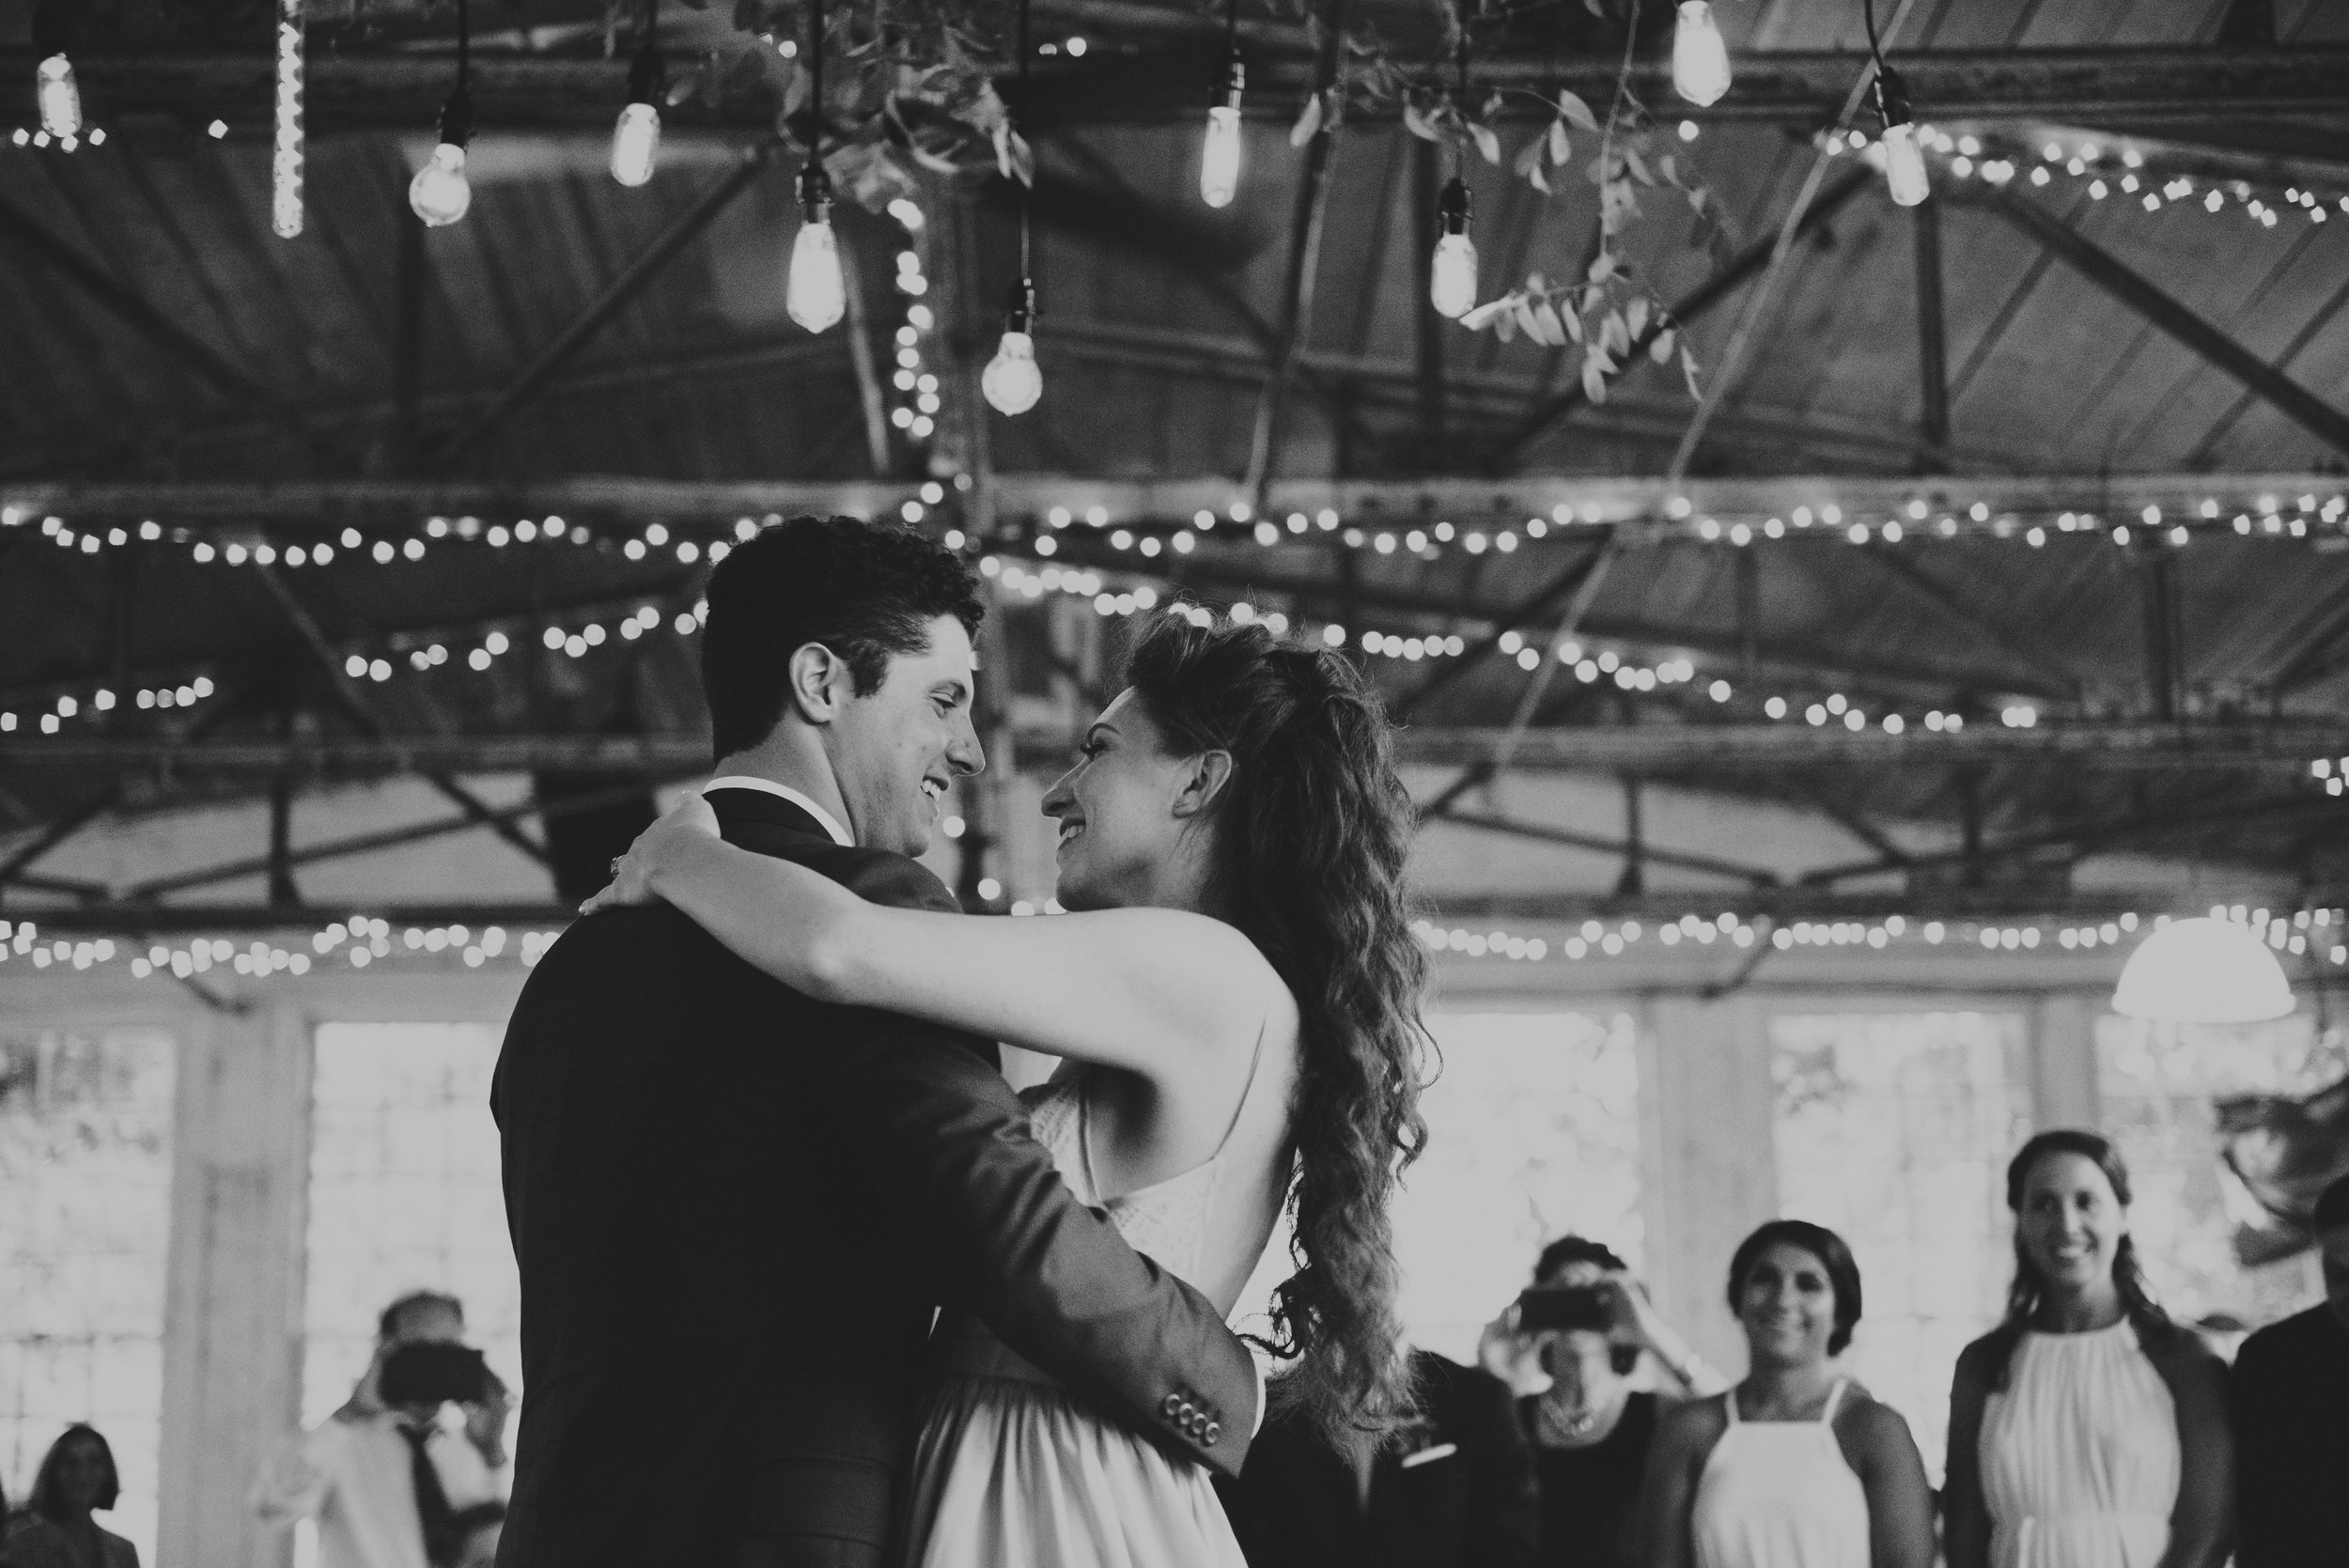 COPPER GEOMETRIC WEDDING LACE FACTORY WEDDING_021.jpg